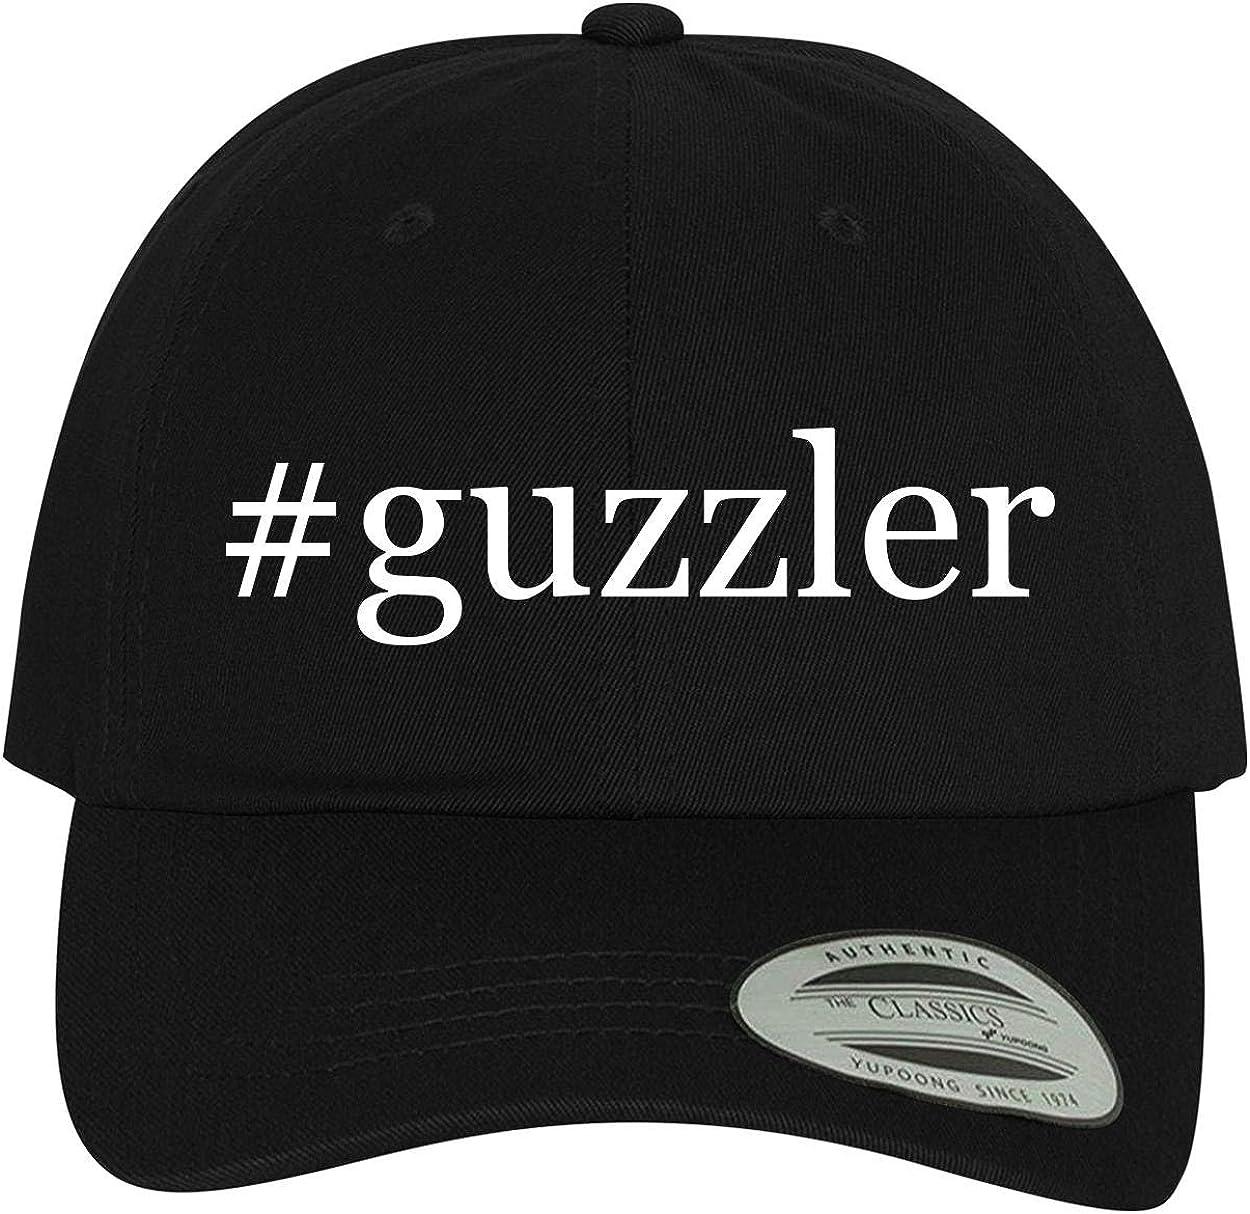 BH Cool Designs #Guzzler Comfortable Dad Hat Baseball Cap